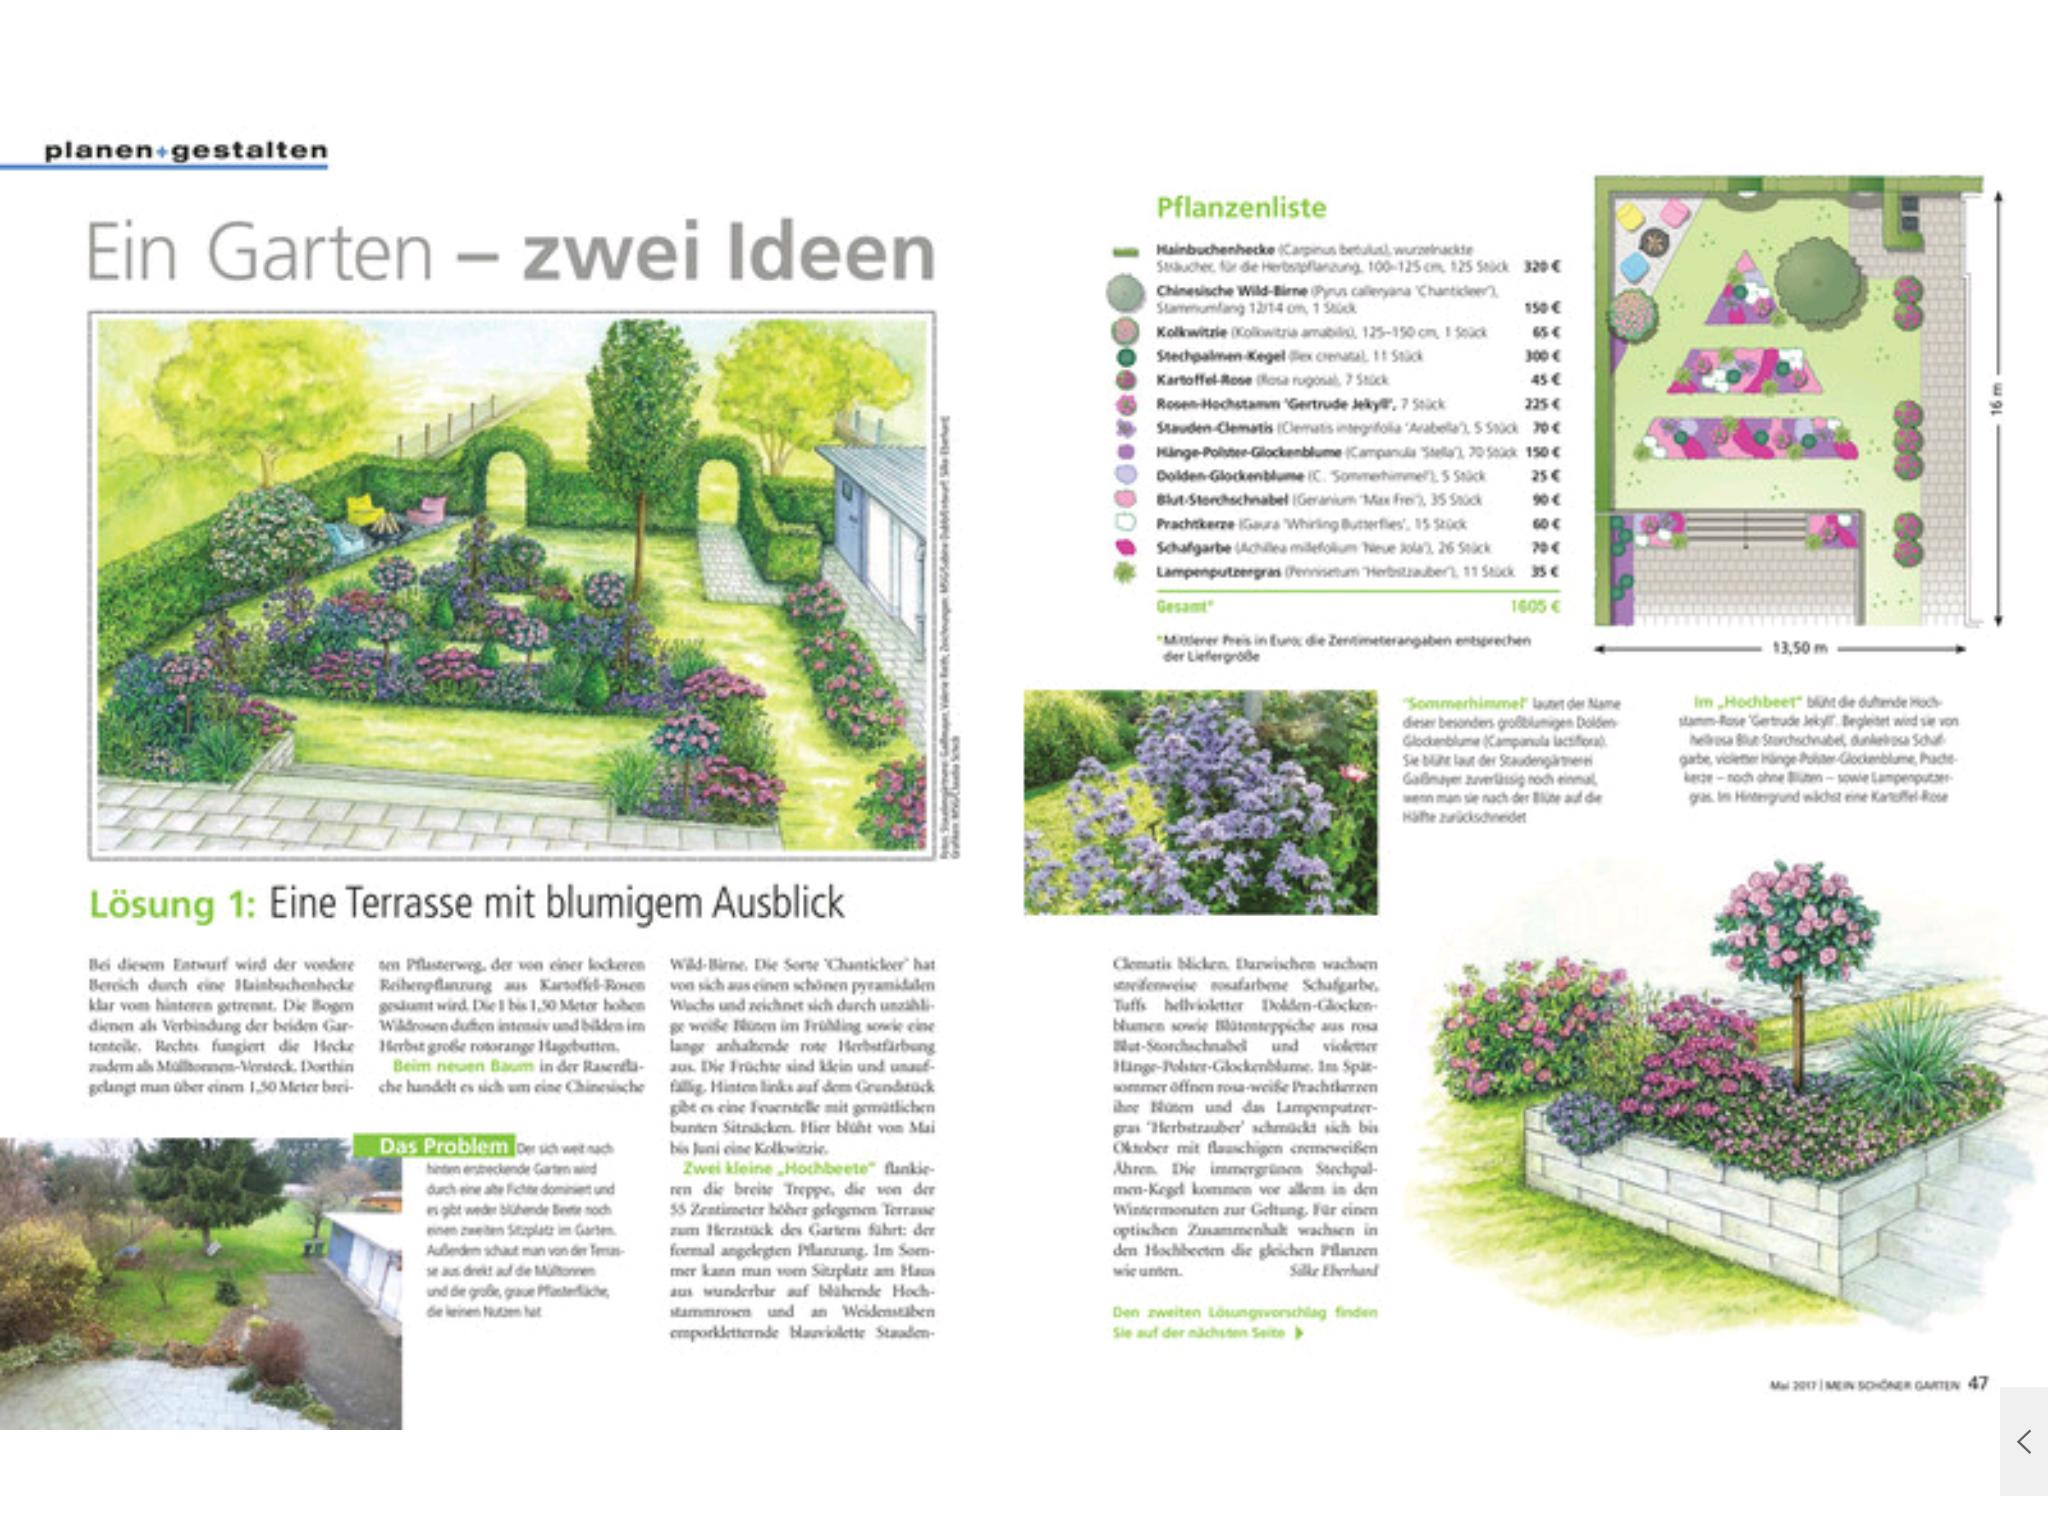 Mein Schoner Garten Magazin For Android Apk Download